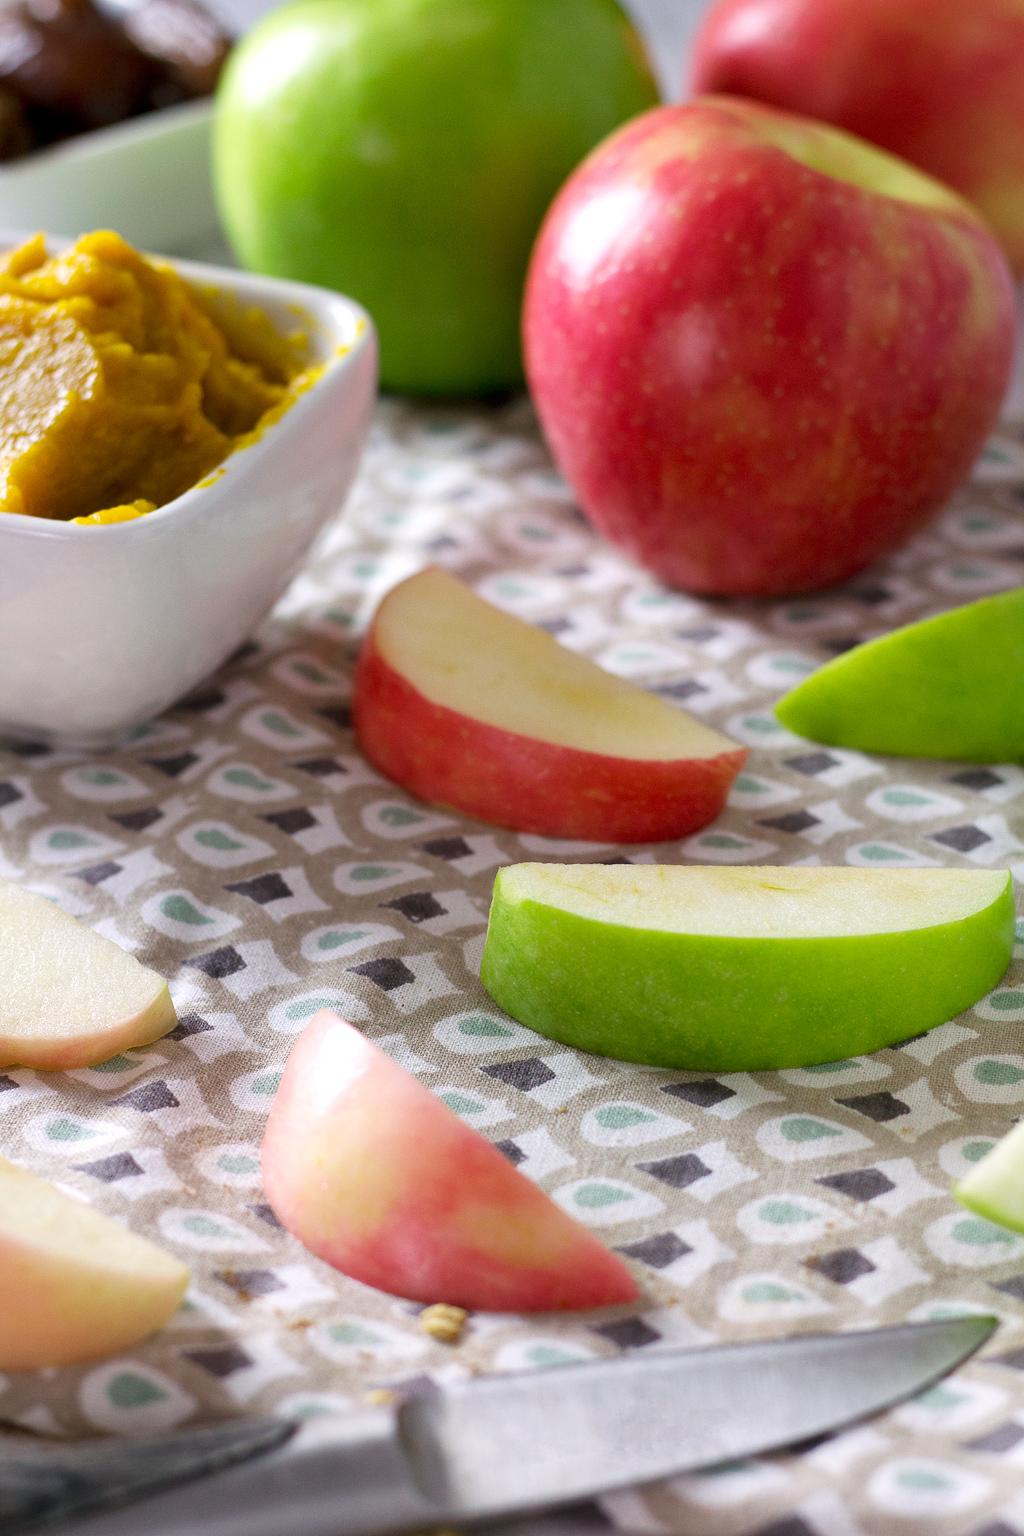 Sliced Apples for Vegan Pumpkin Pie Smoothie Bowl. Topped with granola, apples, goji berries, hemp seeds, pumpkin seeds, and a homemade date caramel sauce!